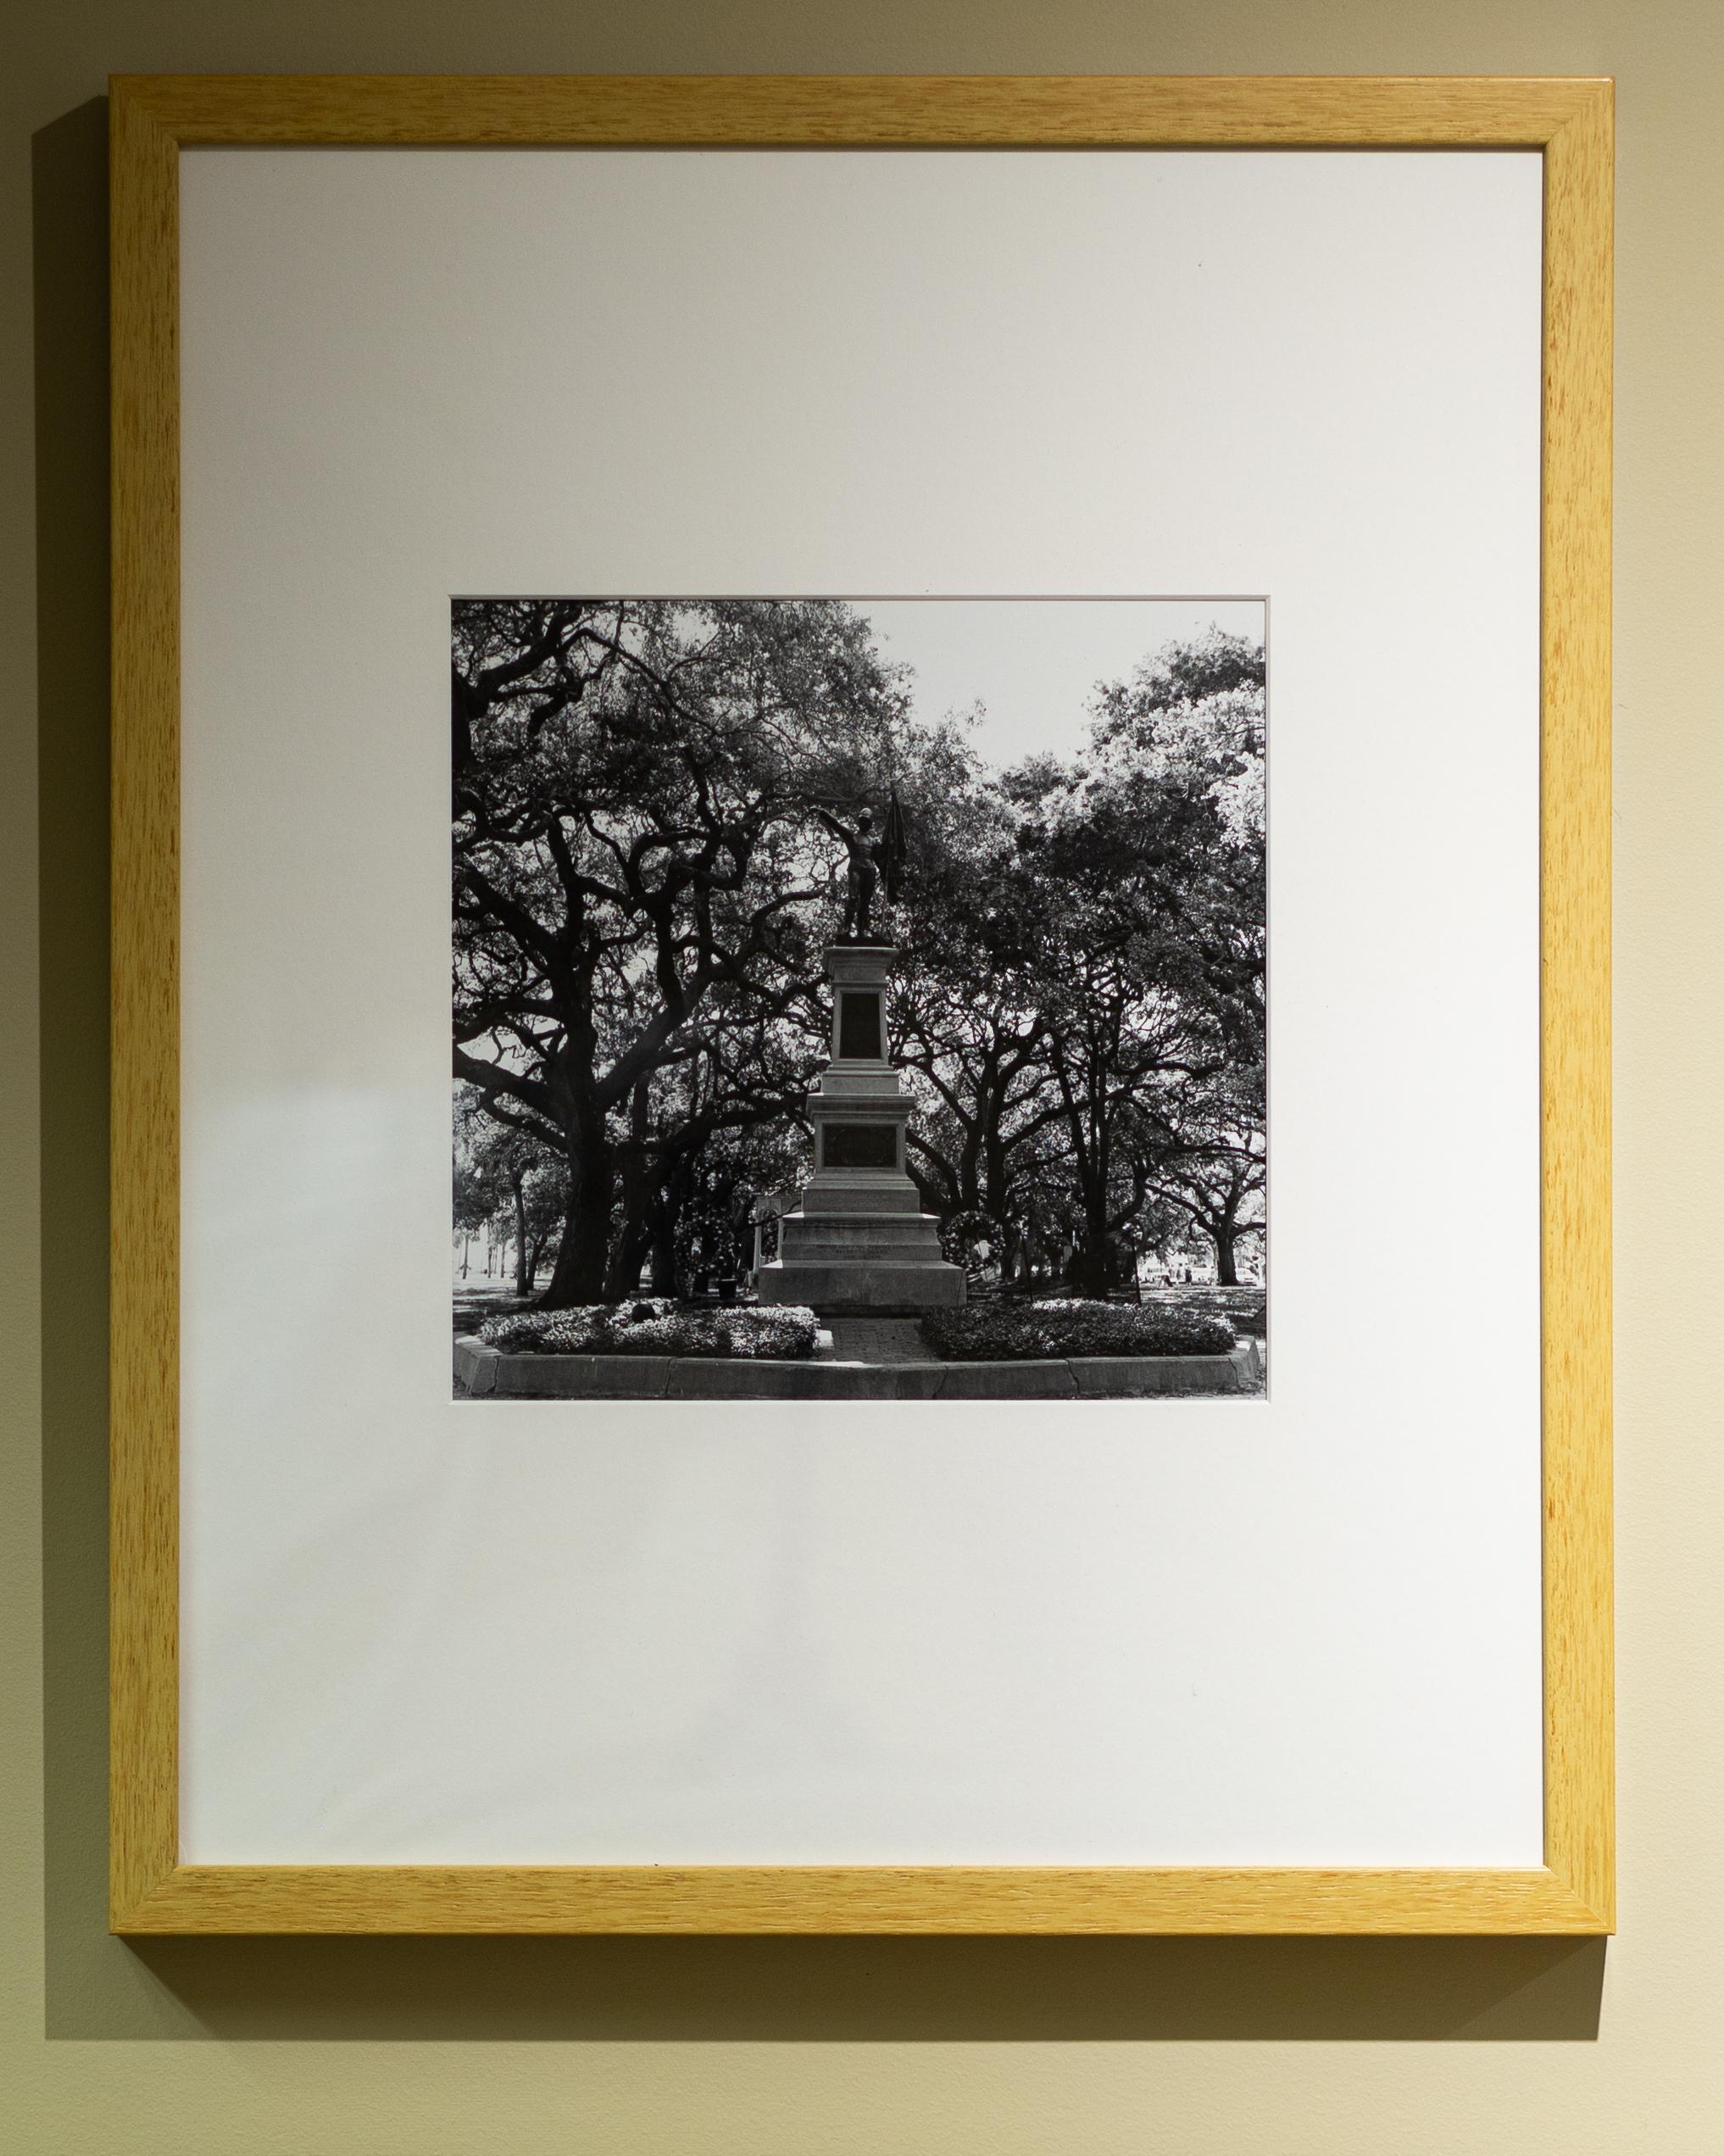 "Paul Lee, Sergeant Jasper Monument, White Point Garden, Charleston, South Carolina, 20"" x 16"", gelatin silver print, 2019"